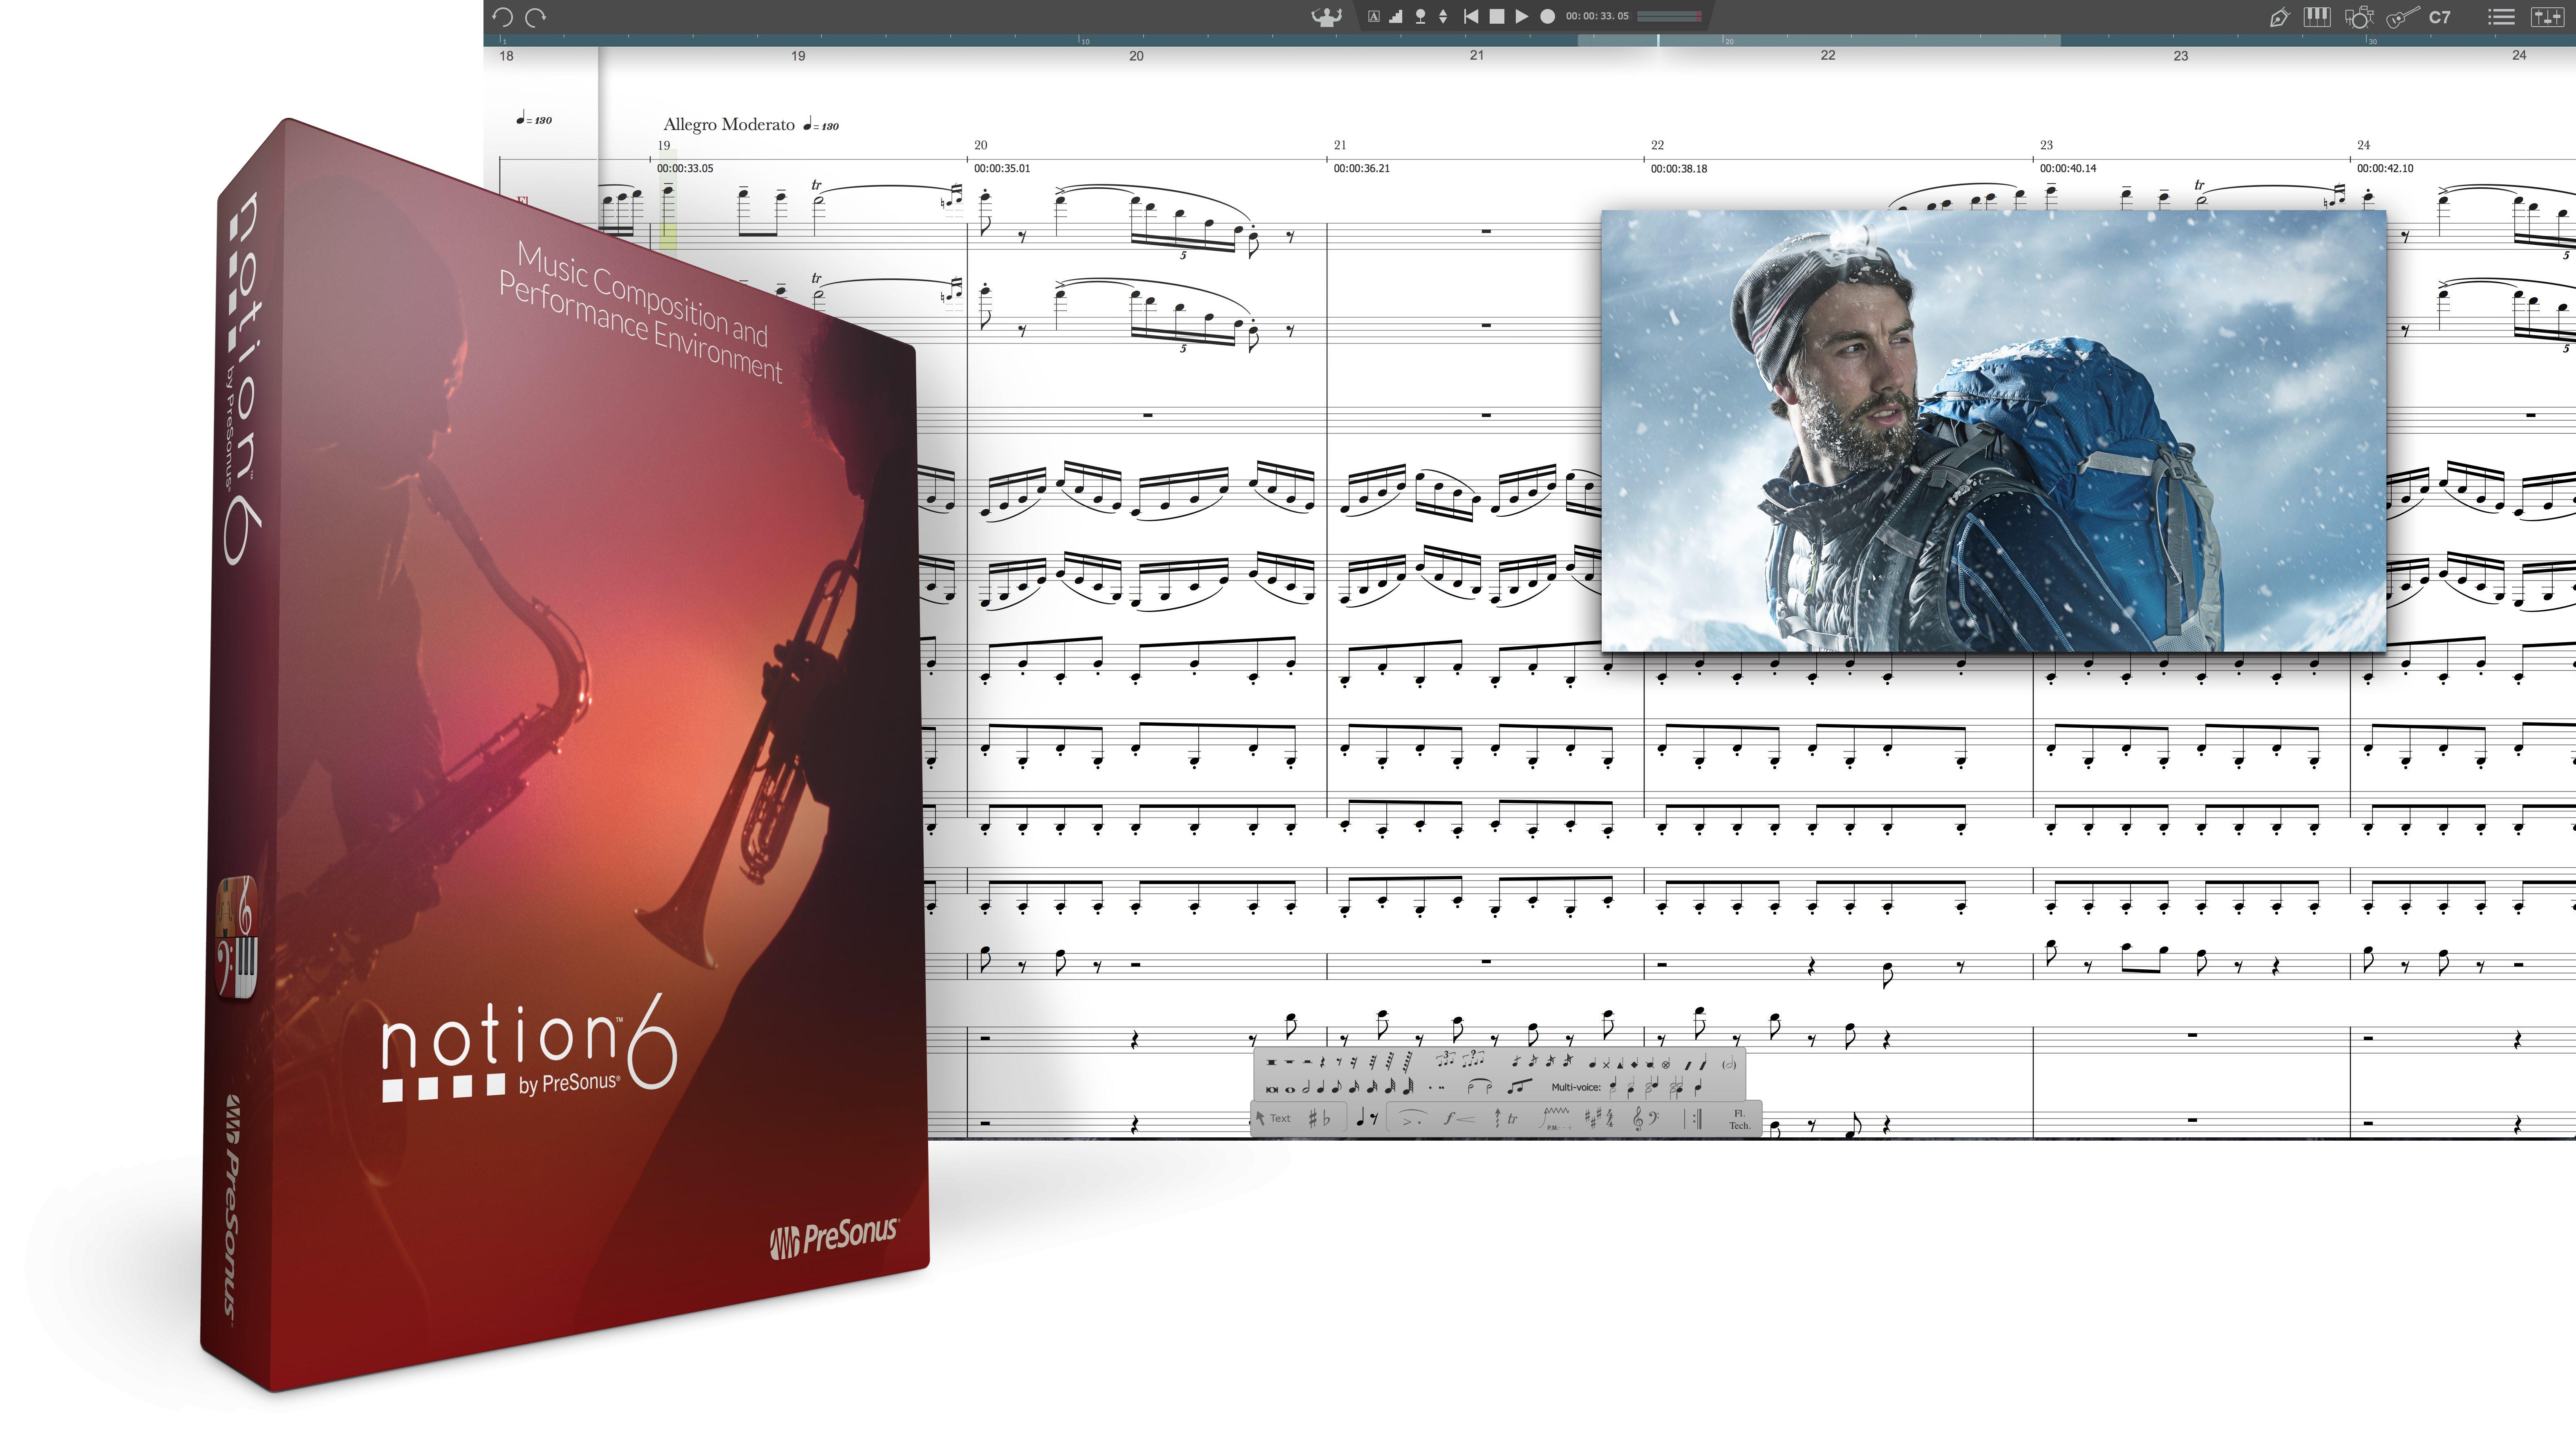 PreSonus Pro Bundle - Studio One 4 Professional and Notion 6